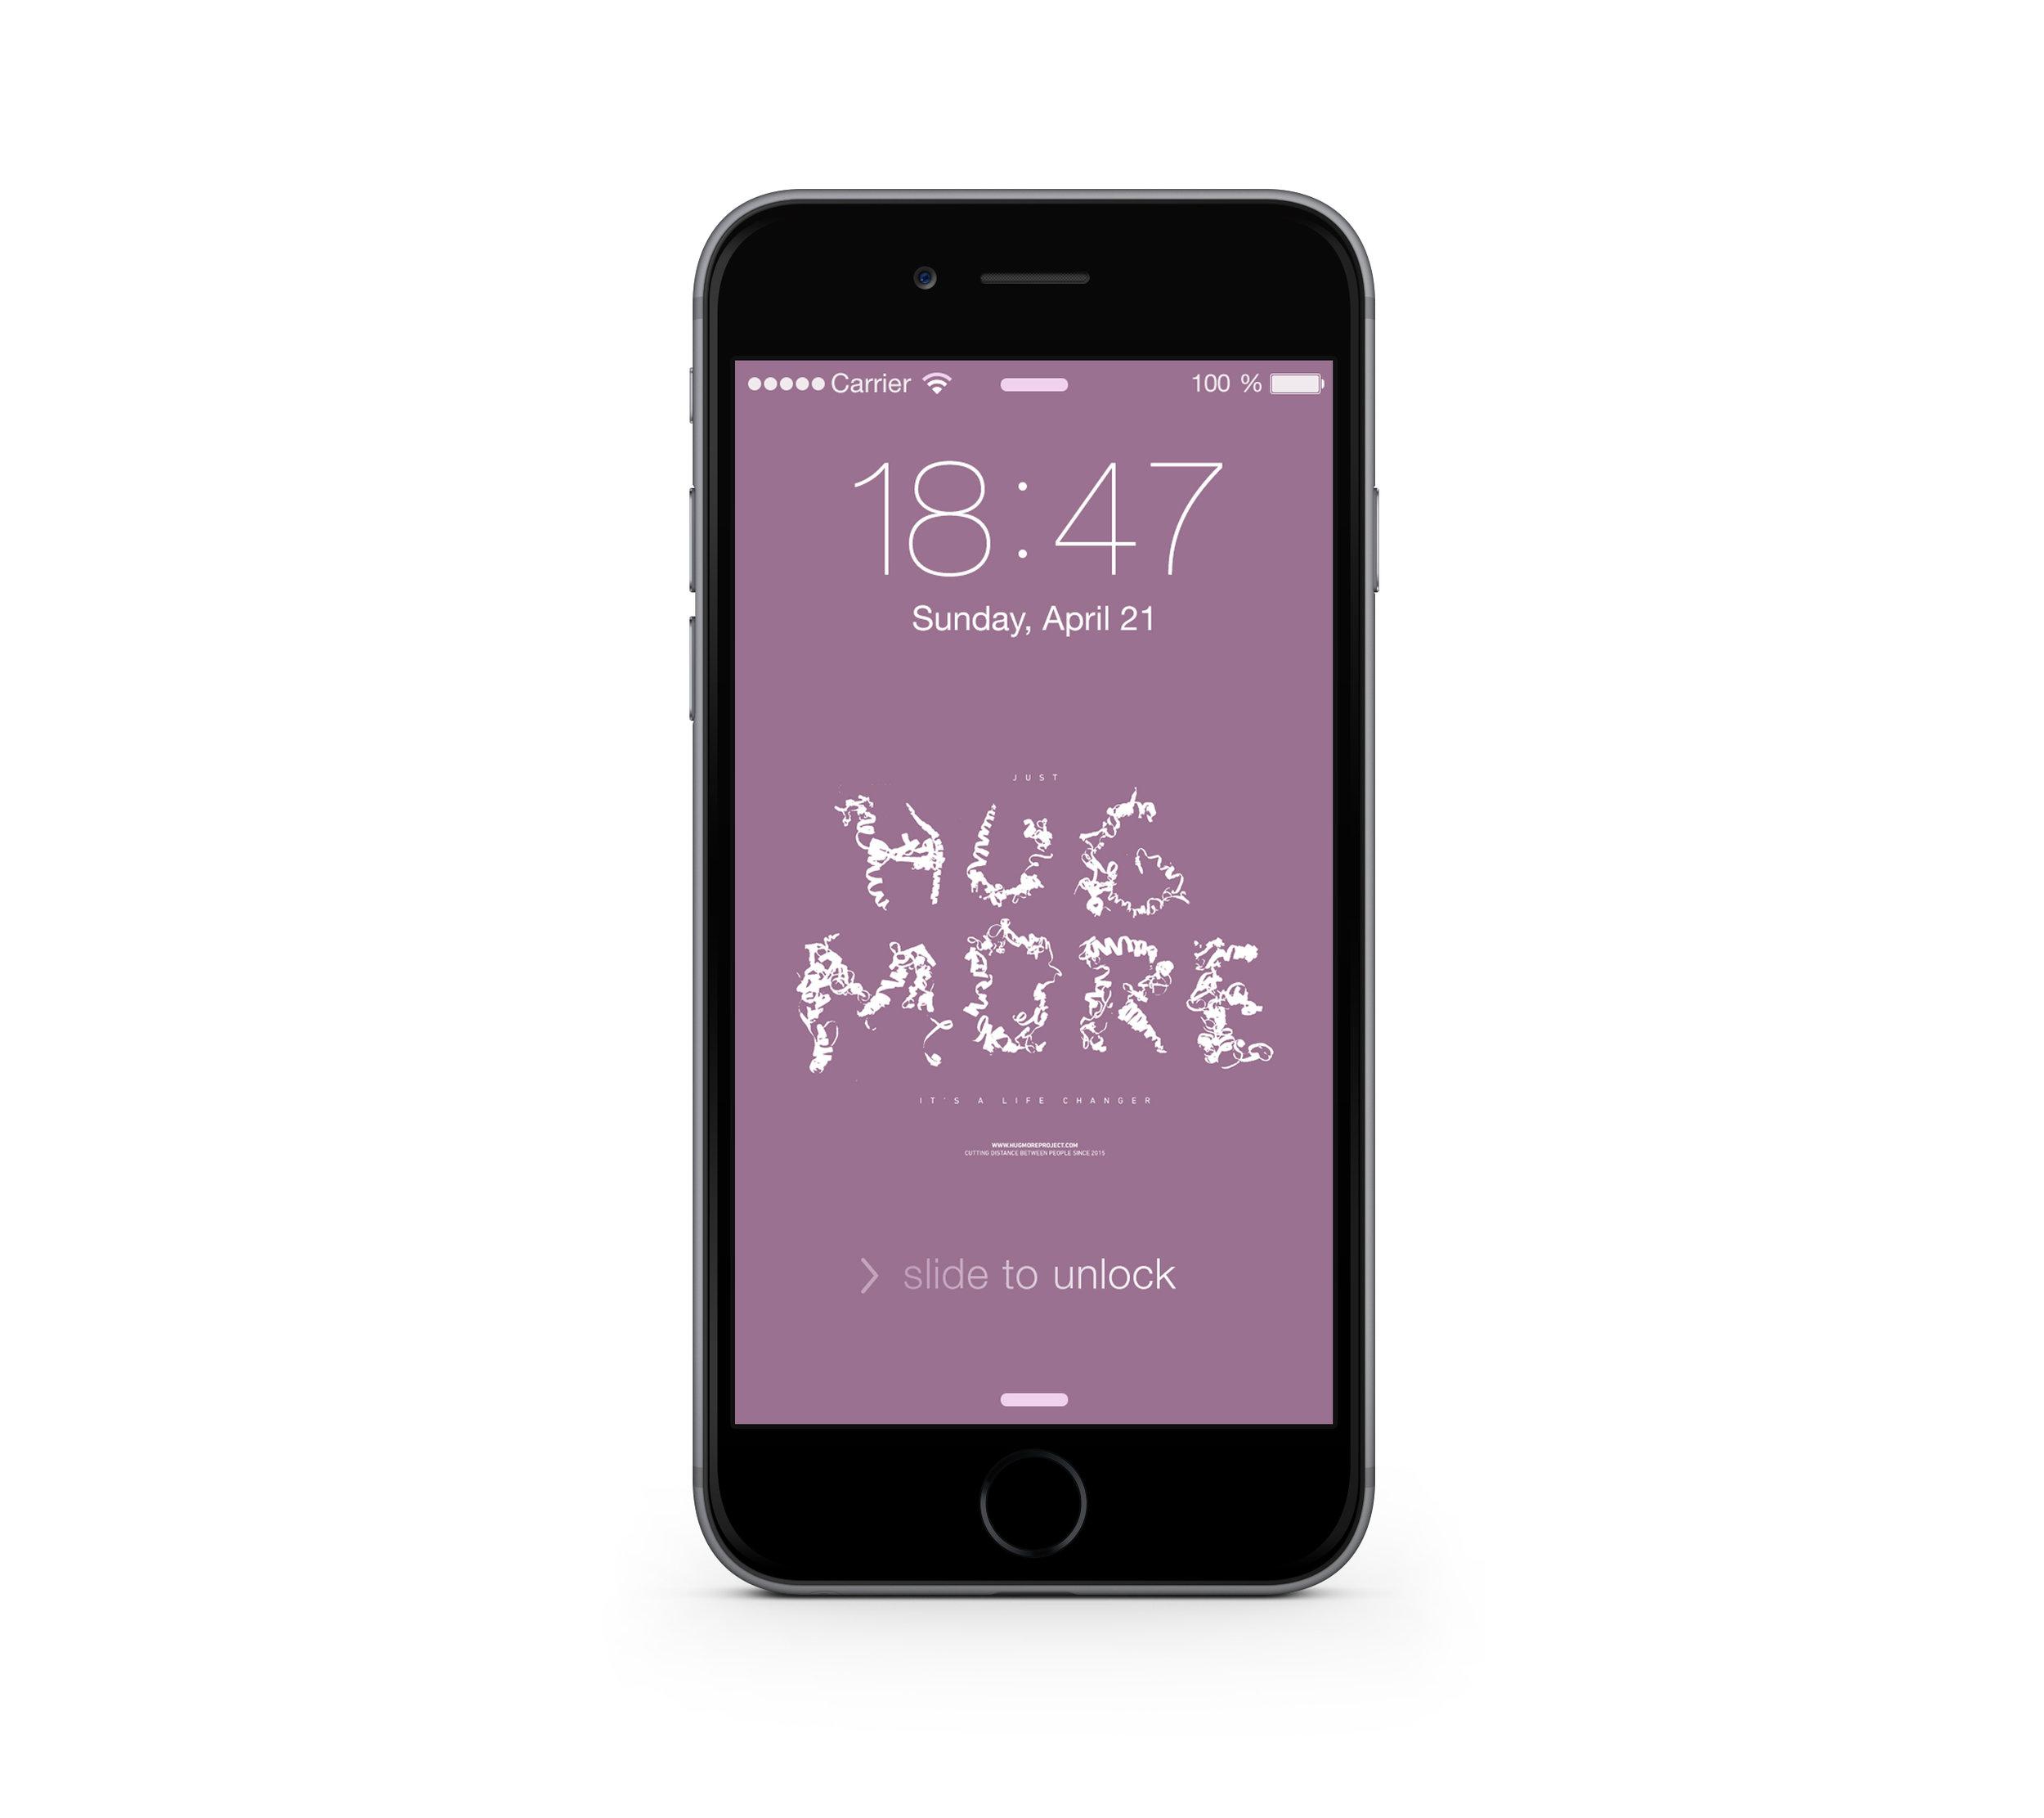 just-hug-more-typo-022-iPhone-mockup-onwhite.jpg